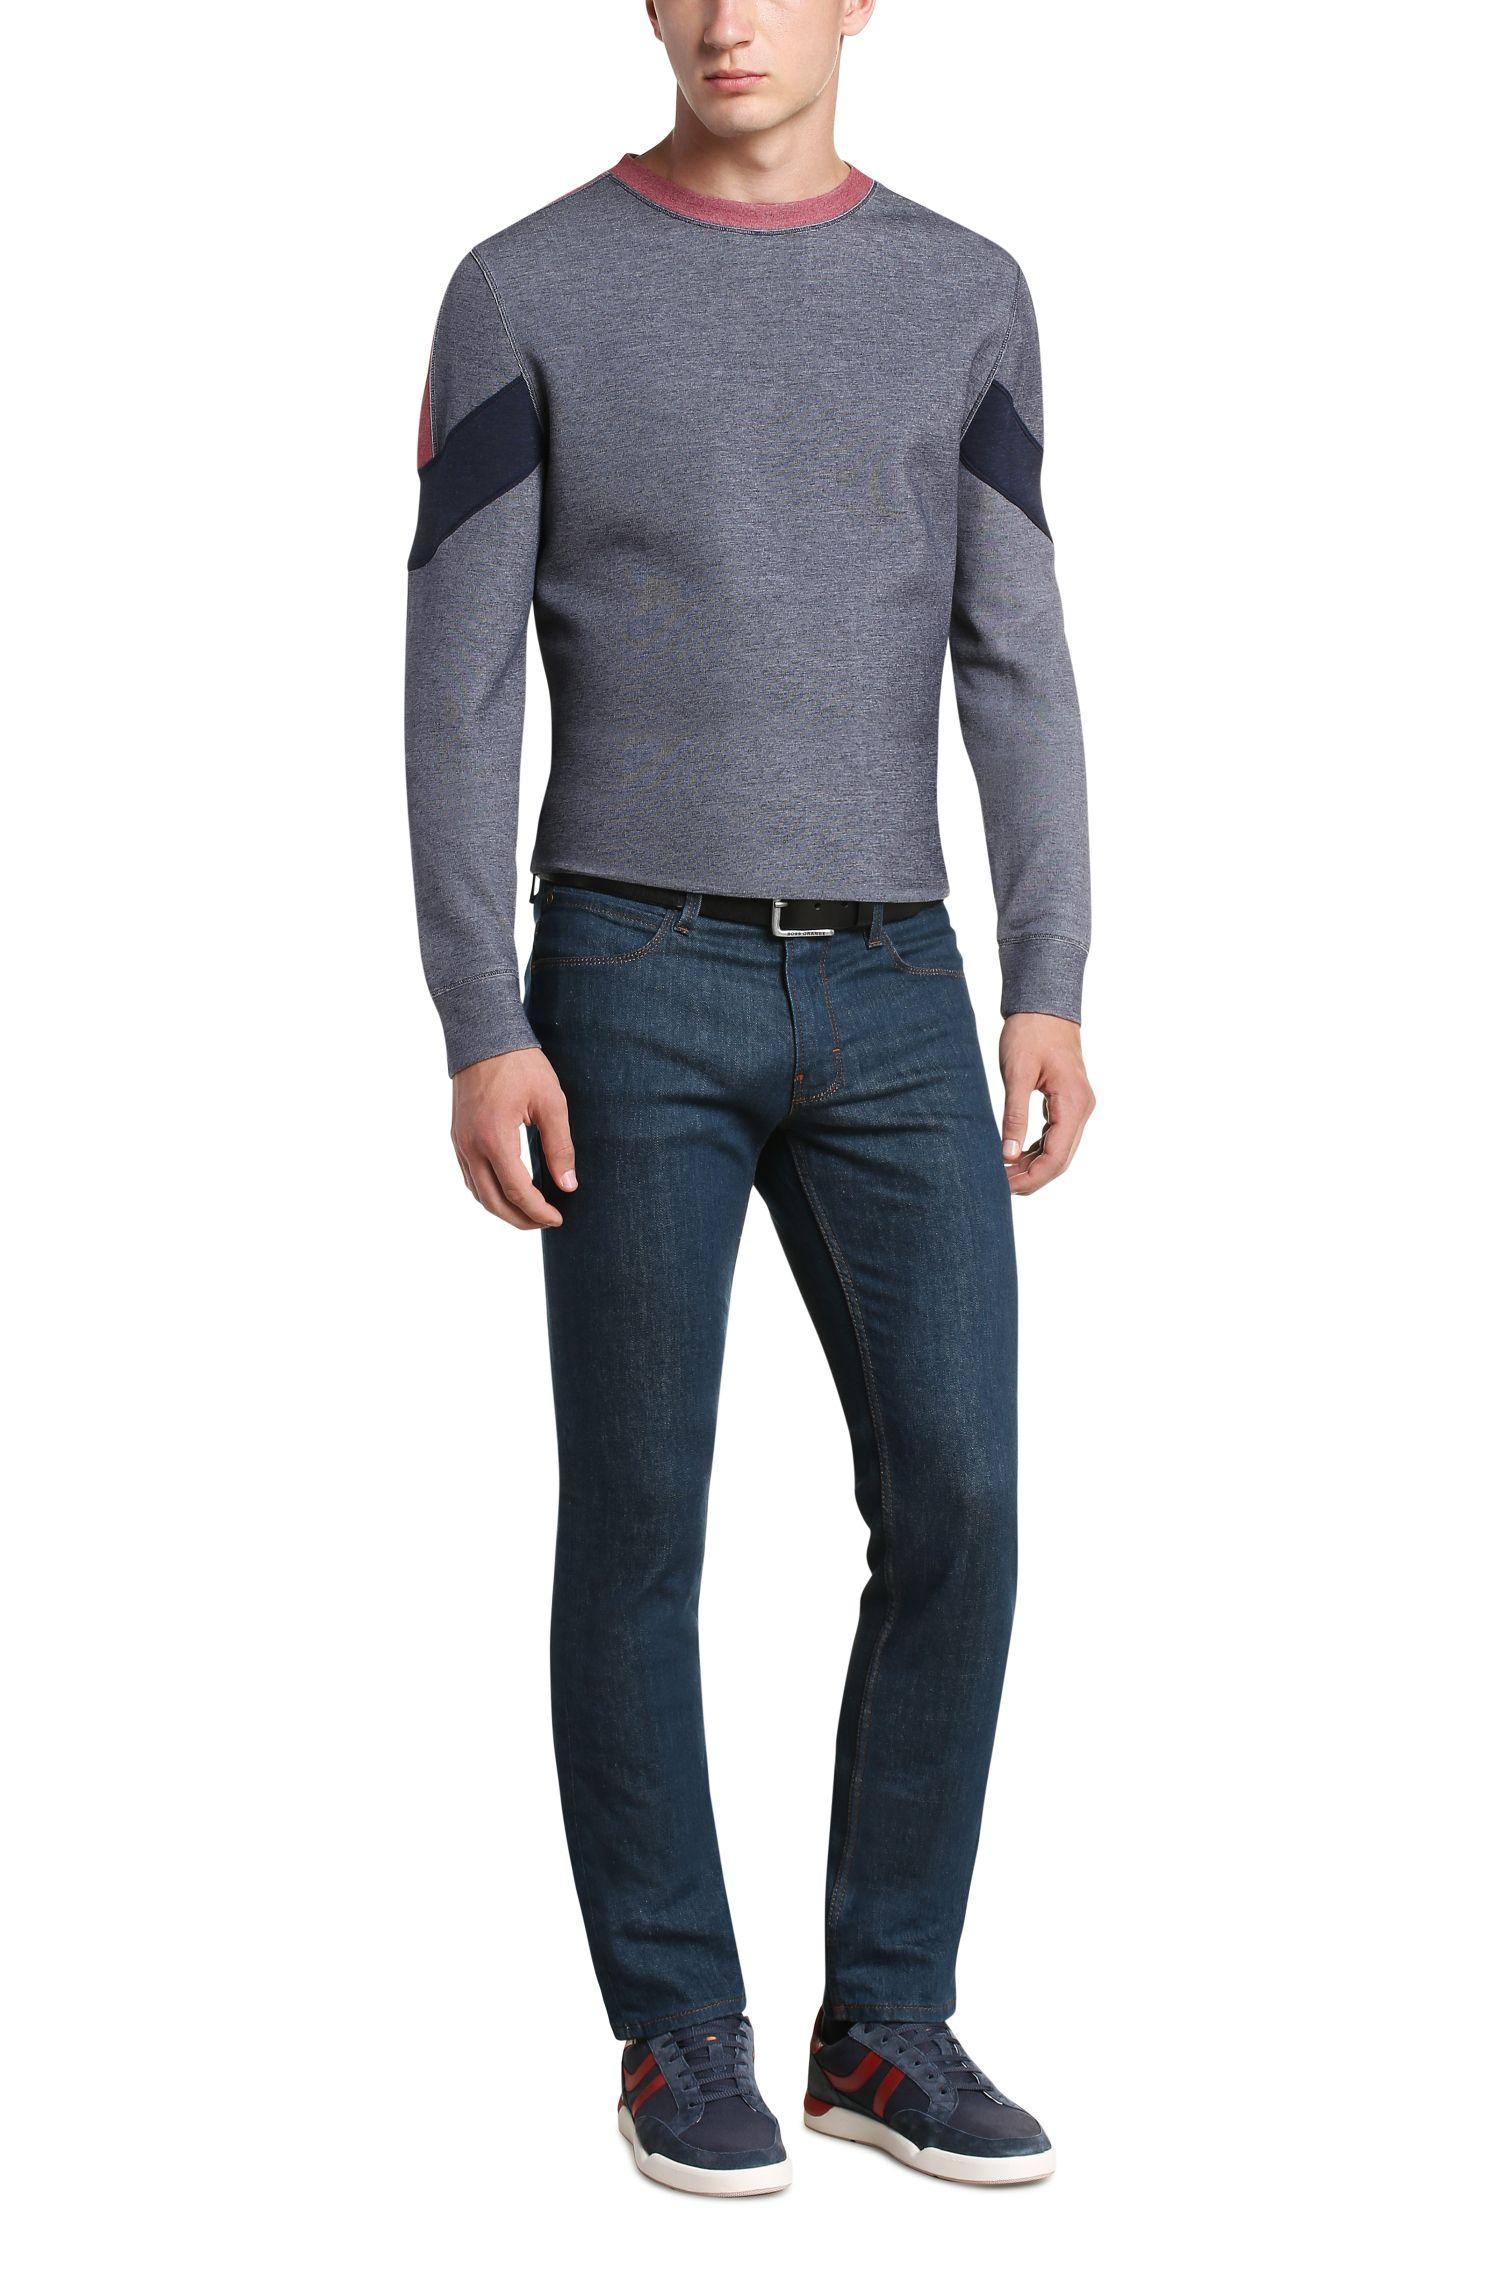 Relaxed-Fit Sweatshirt aus Baumwoll-Mix: ´Writer`